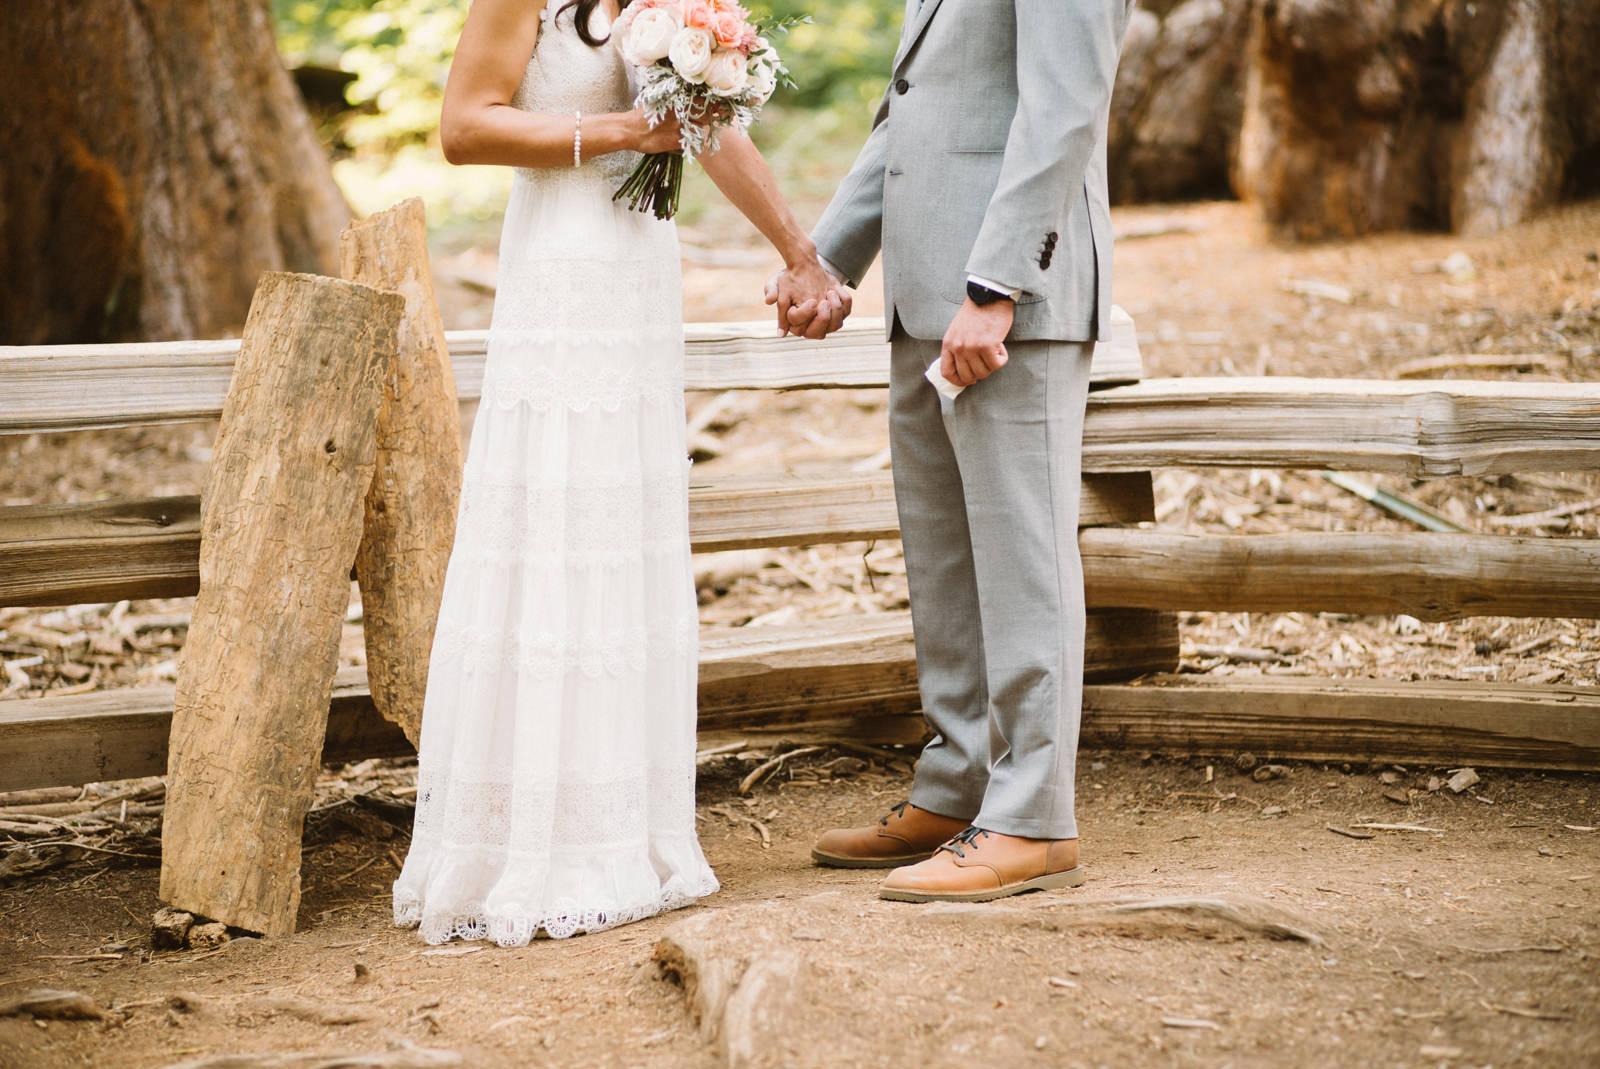 yosemite-intimate-wedding-046 YOSEMITE INTIMATE WEDDING